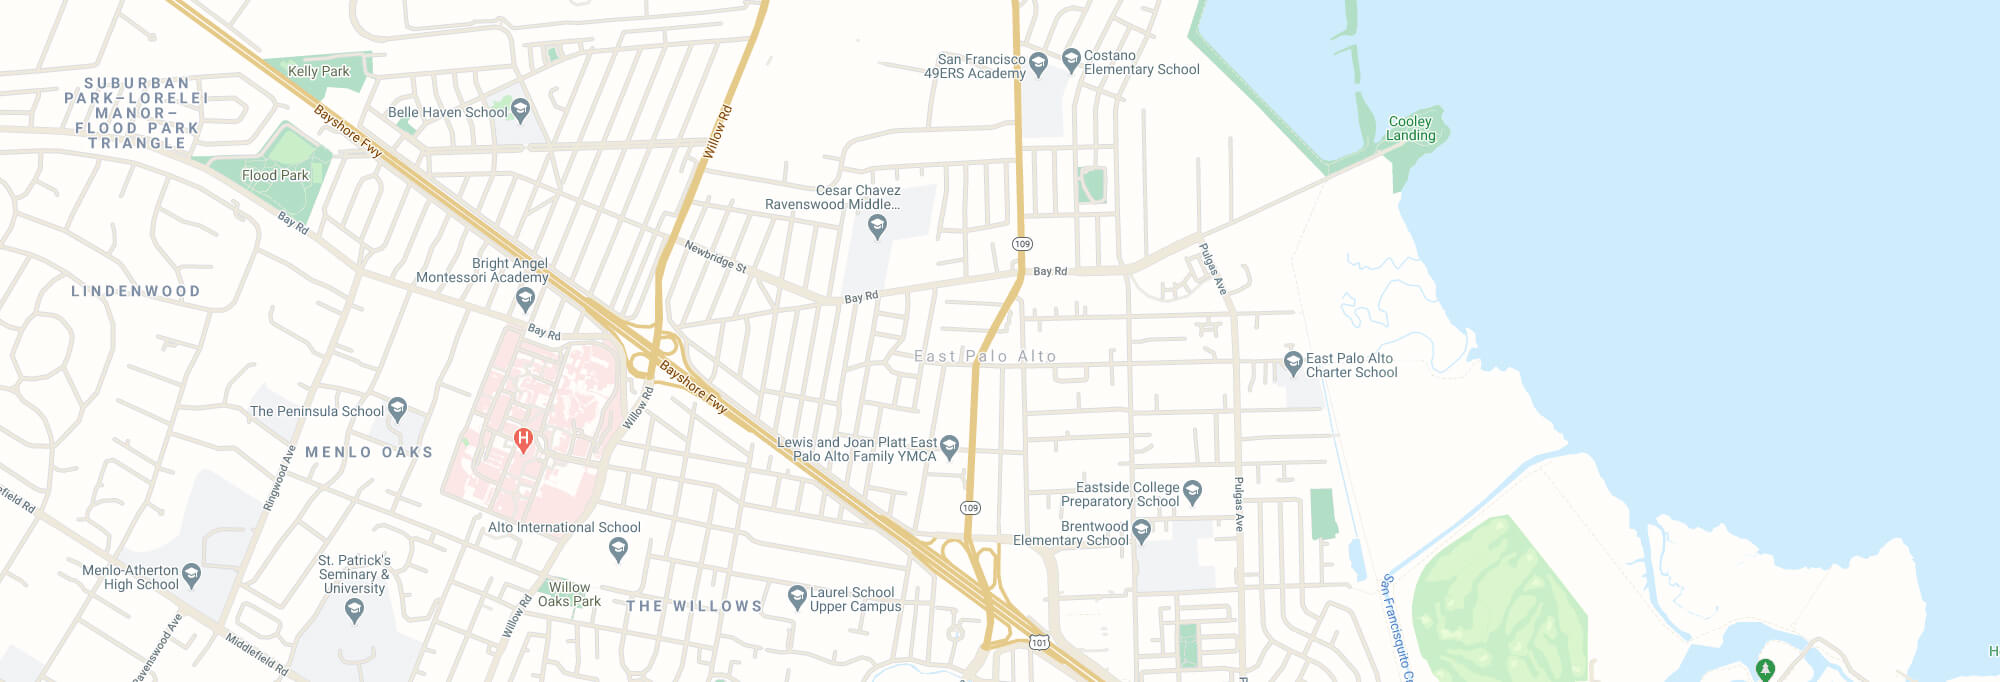 East Palo Alto city map